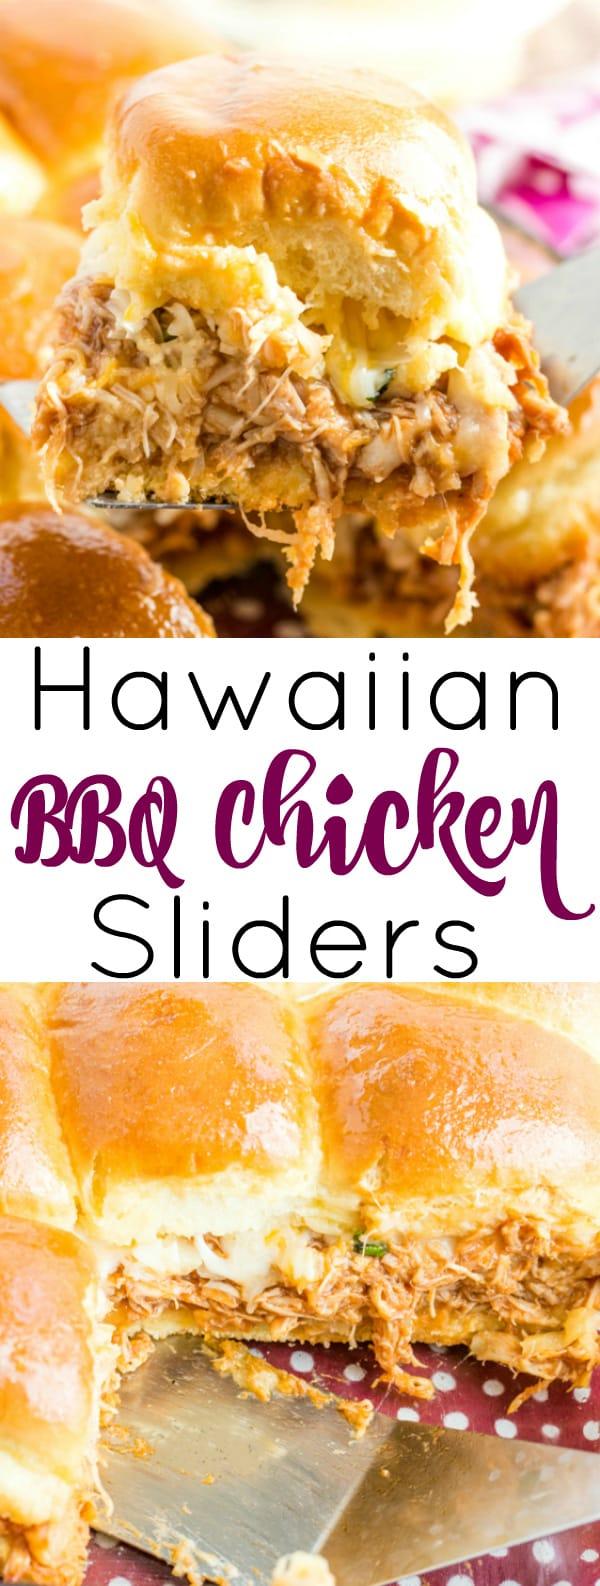 Hawaiian BBQ Chicken Sliders